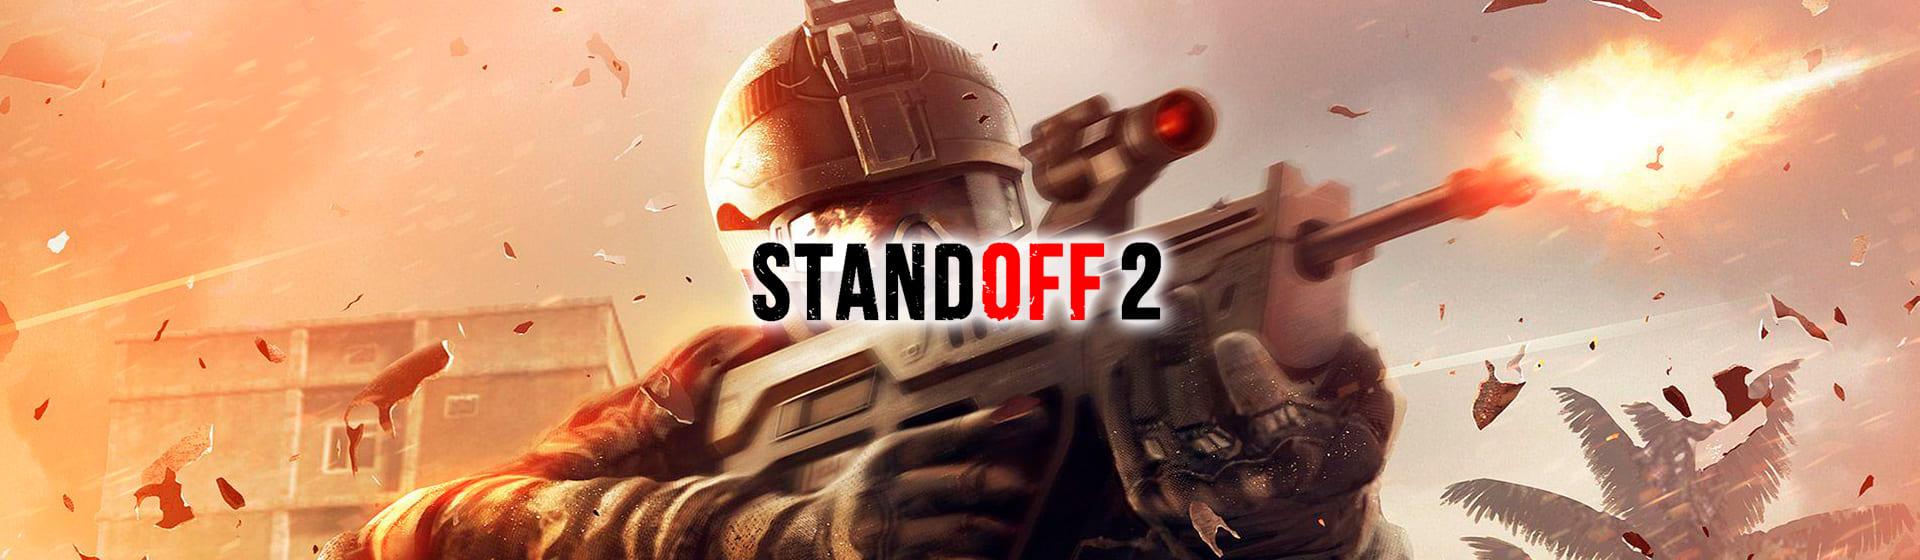 Standoff 2